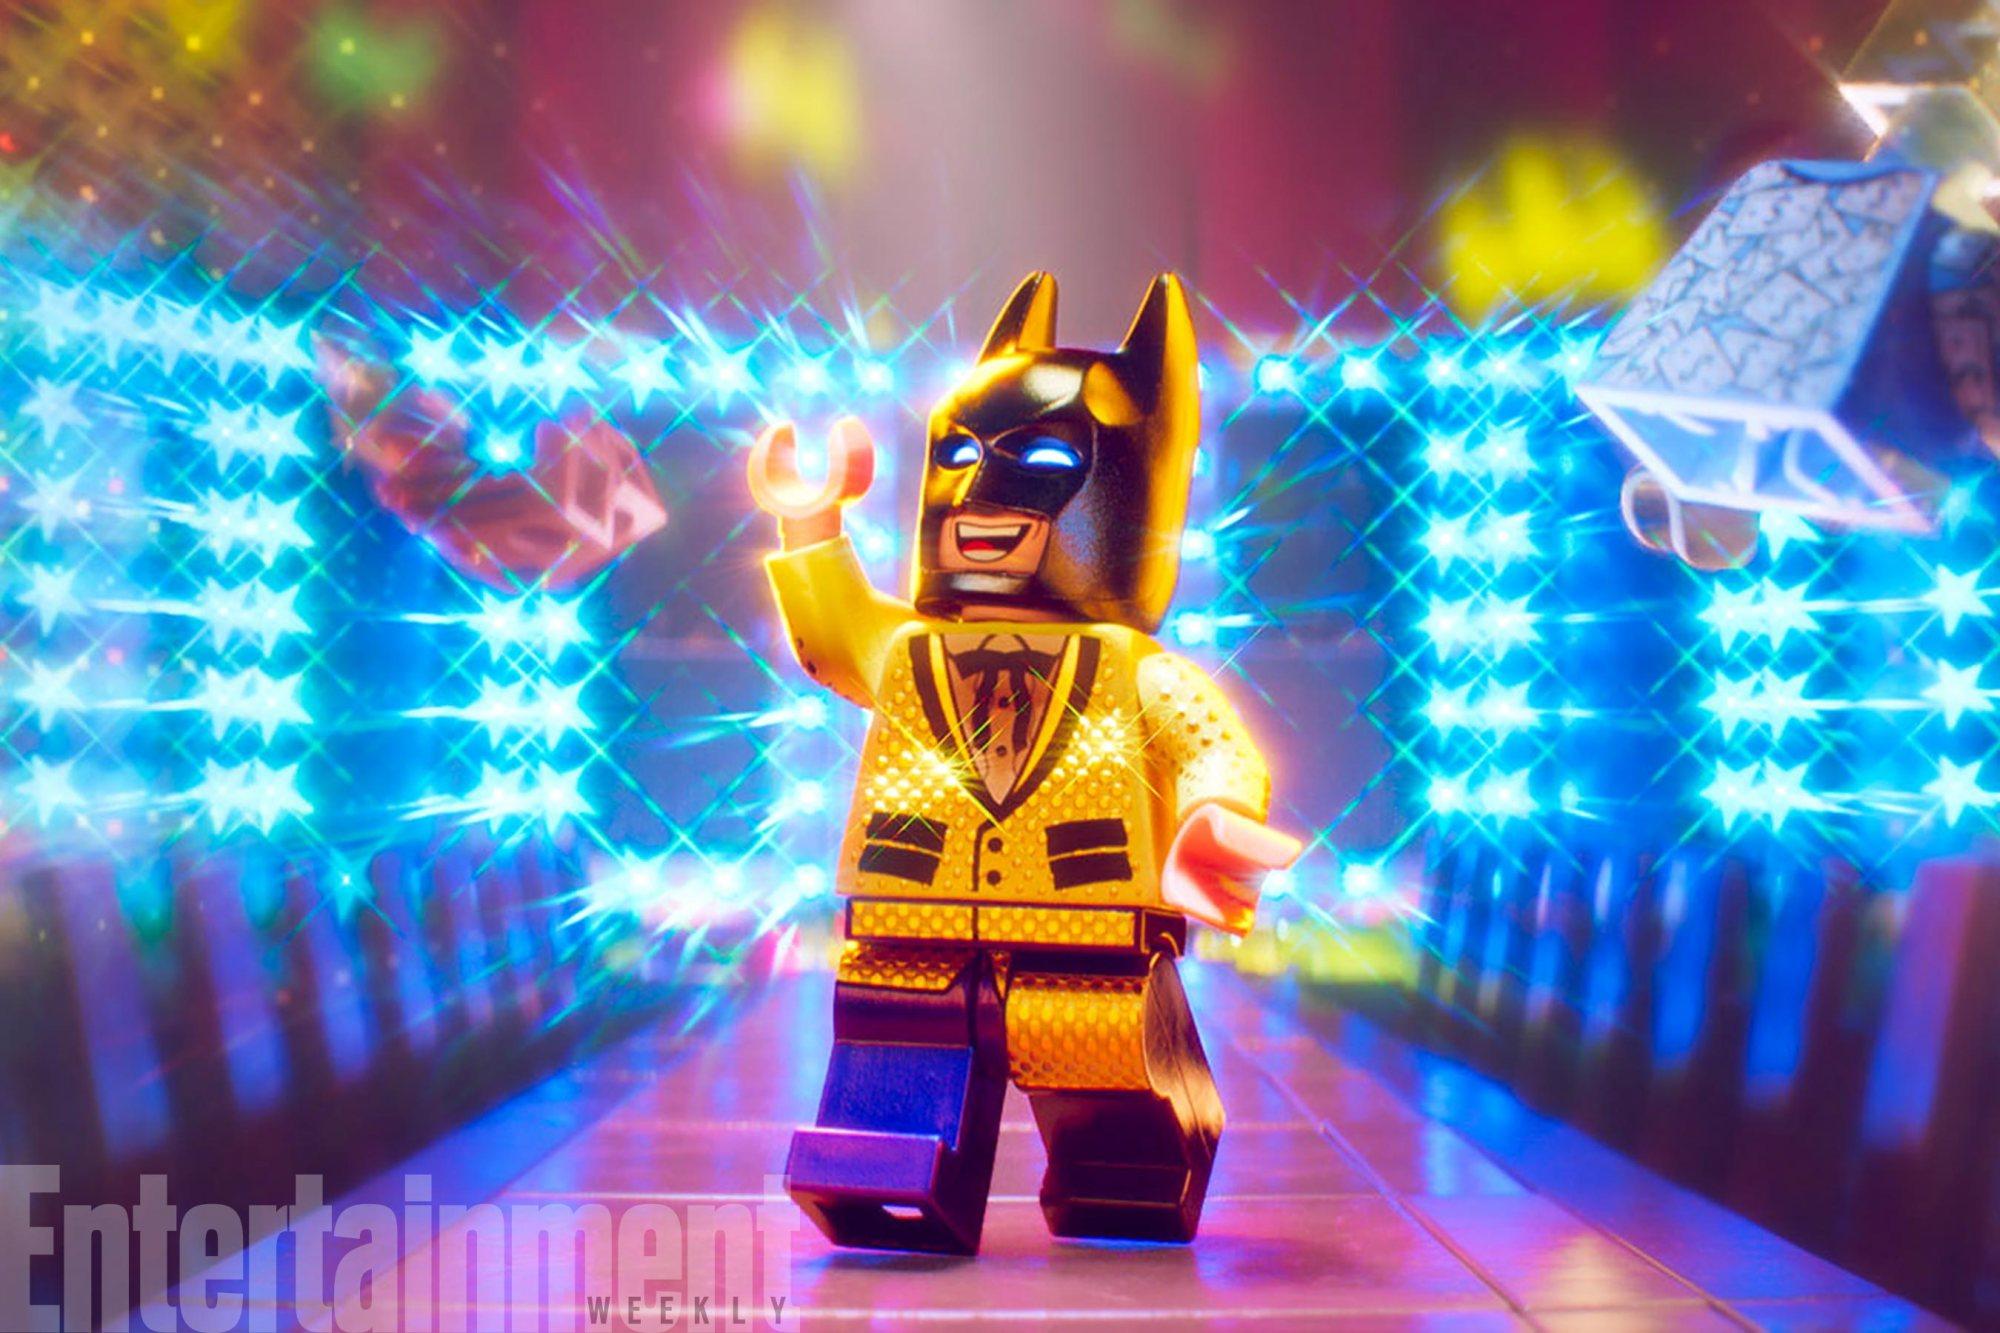 the-dark-knight-sports-a-gold-tuxedo-in-new-photo-from-the-lego-batman-movie